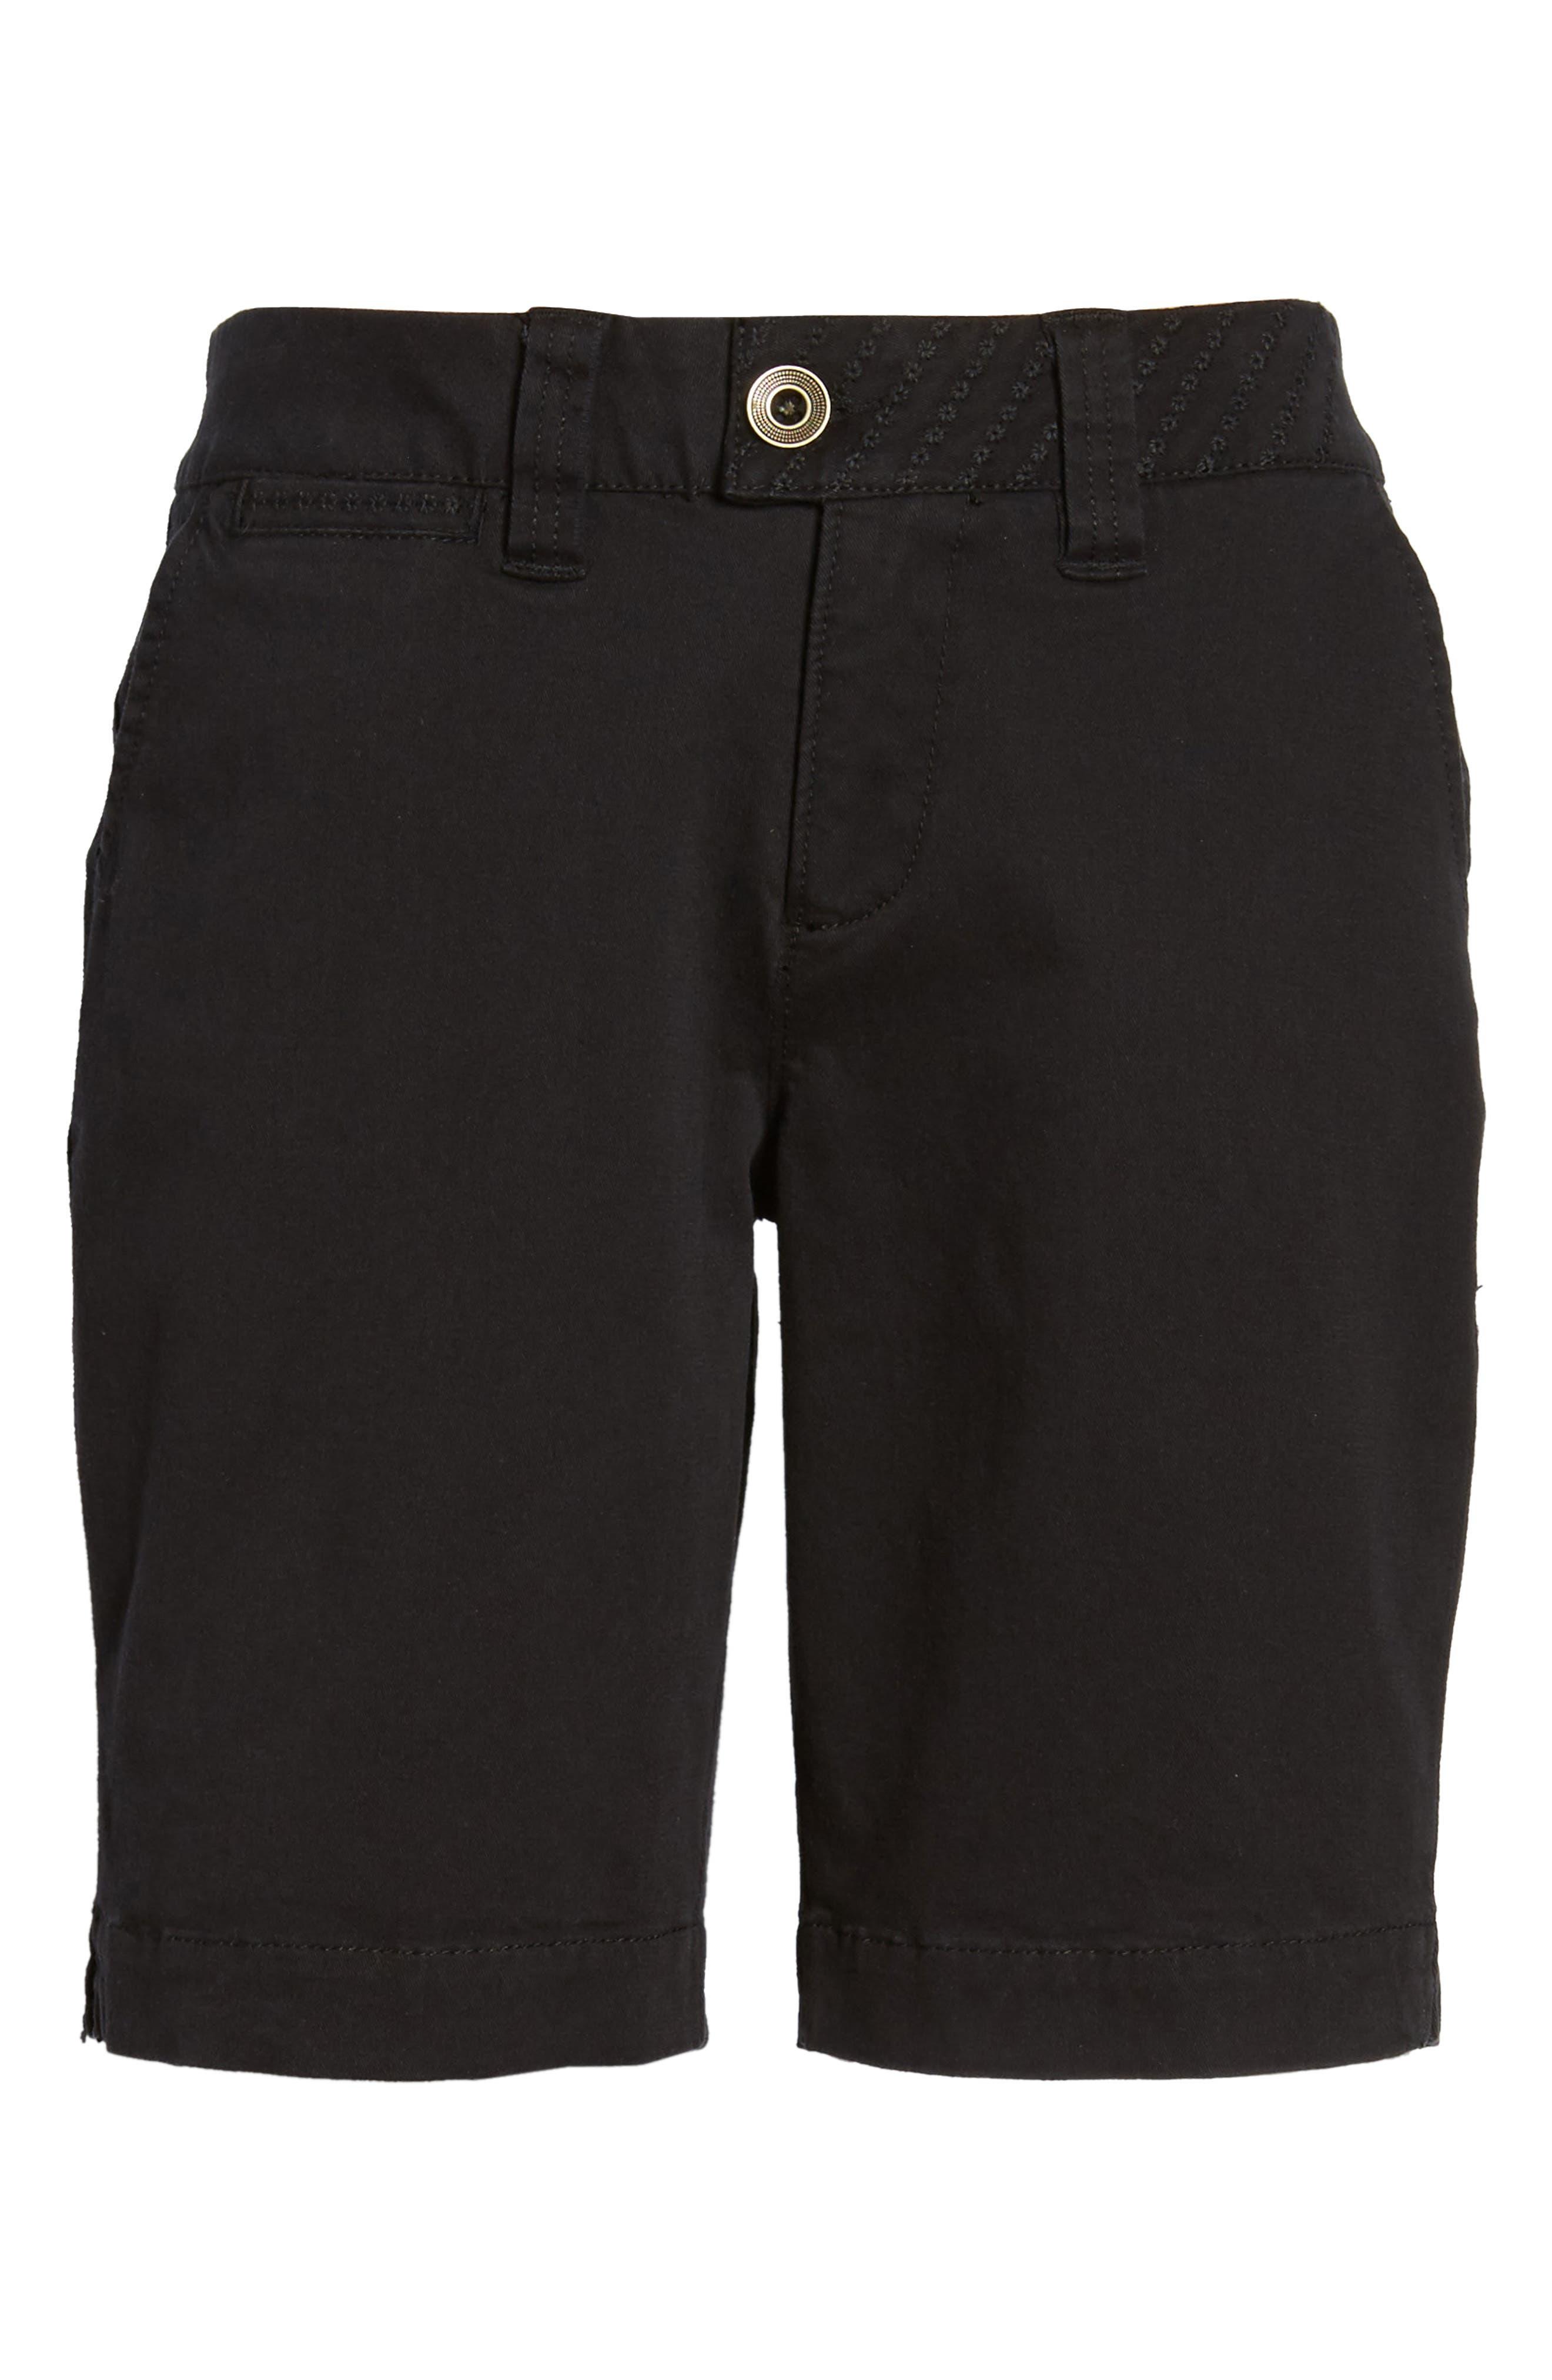 Creston Twill Shorts,                             Alternate thumbnail 6, color,                             001